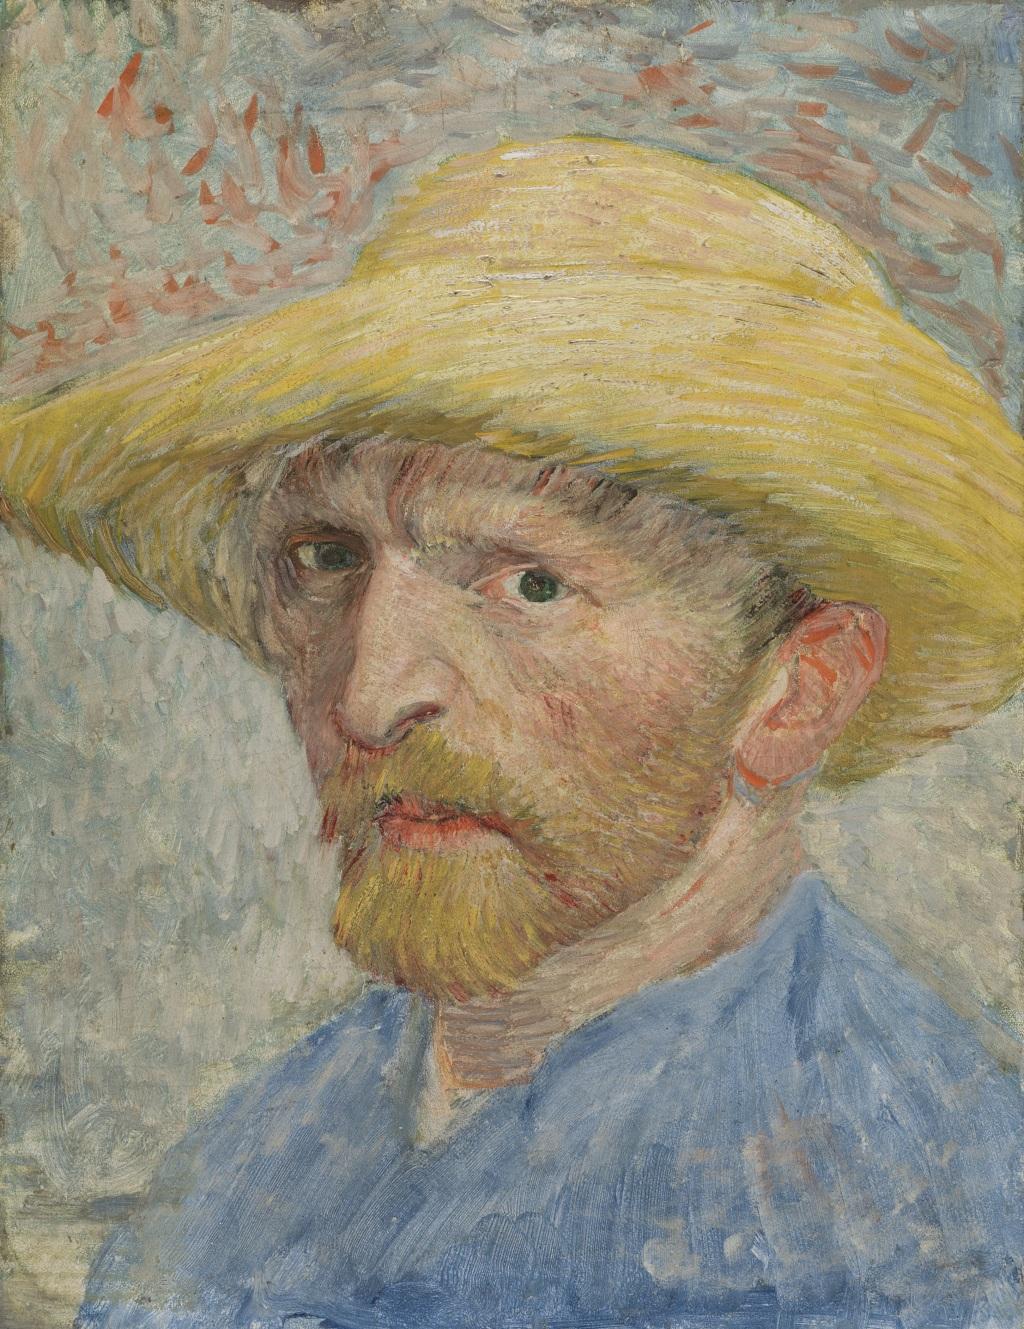 Vincent van Gogh, 'Self-Portrait,' 1887, oil on artist board, mounted to wood panel.